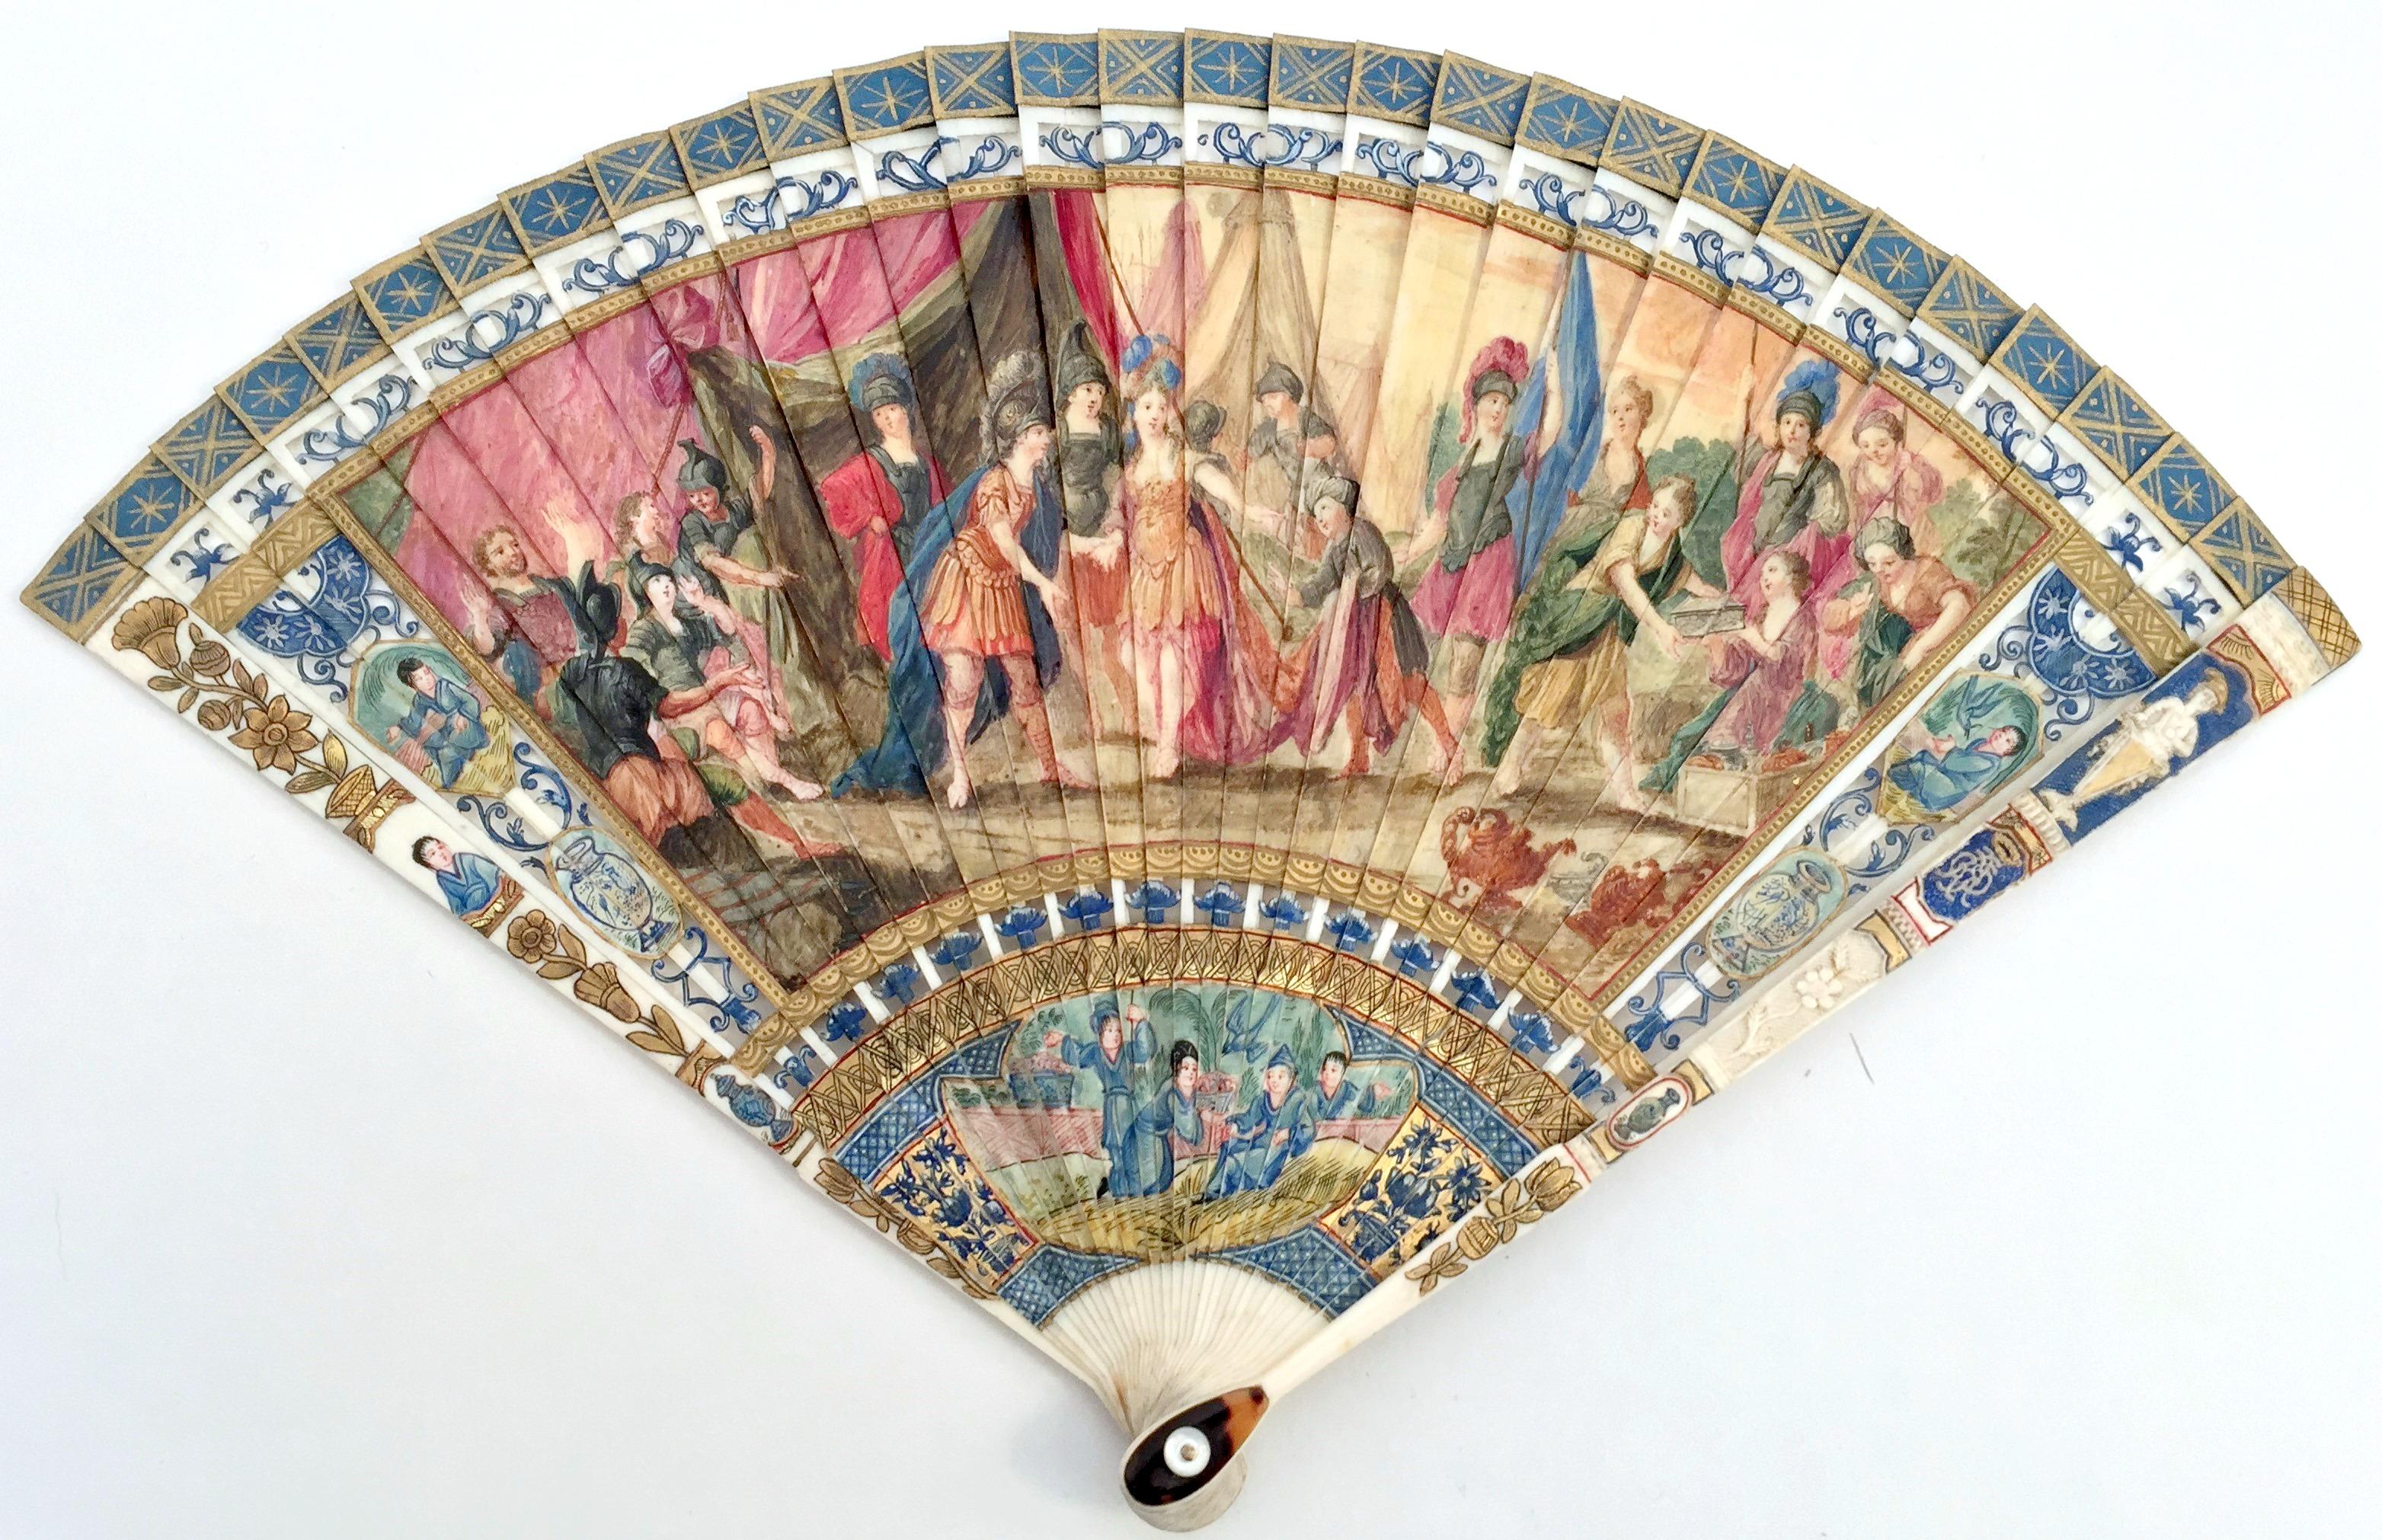 Brise Fan before conservation